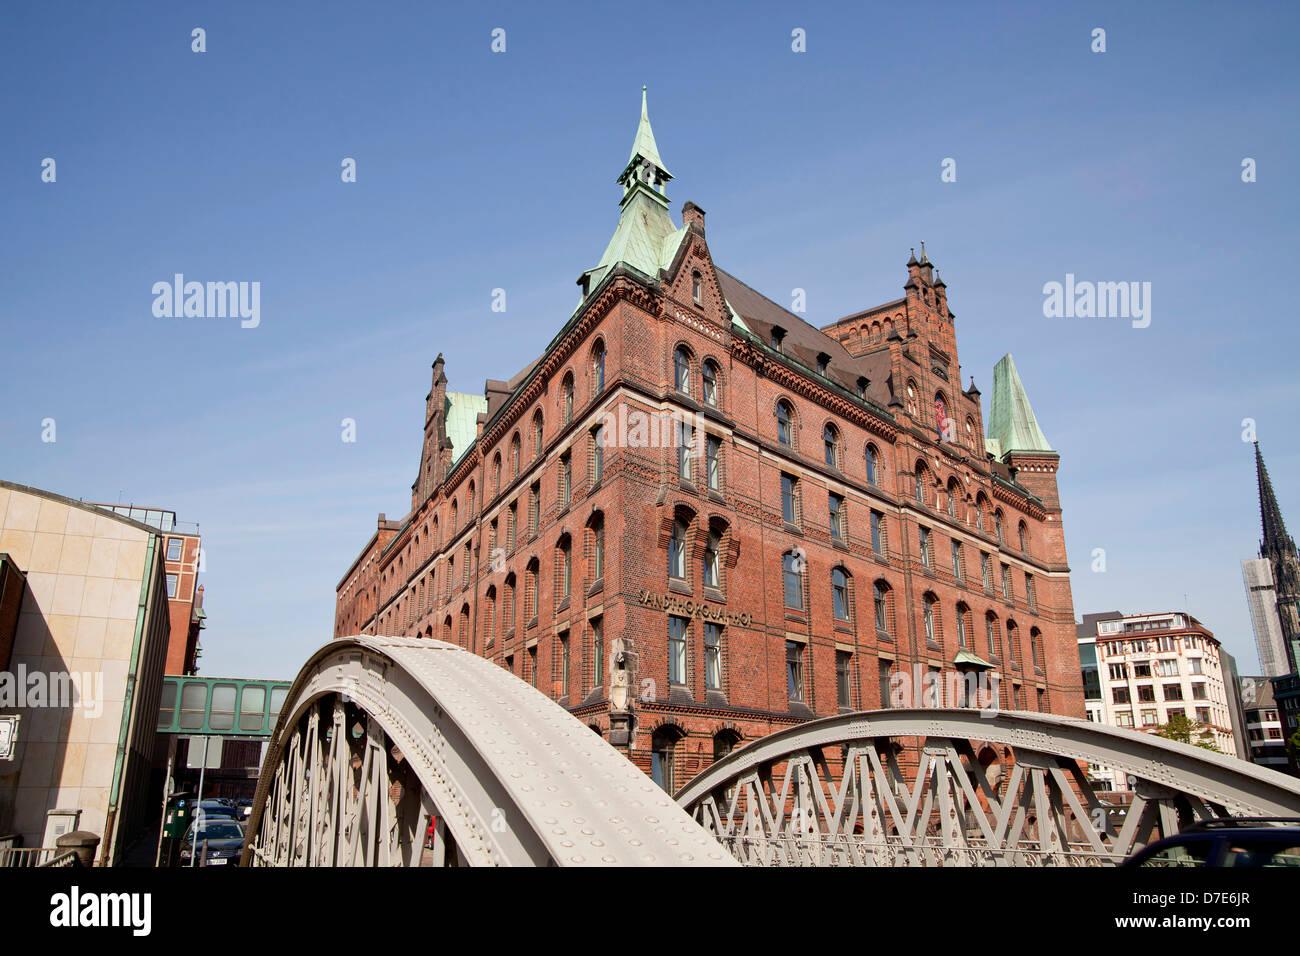 bridge and the Sandthorquaihof in the Speicherstadt district, Free and Hanseatic City of Hamburg, Germany, Europe Stock Photo